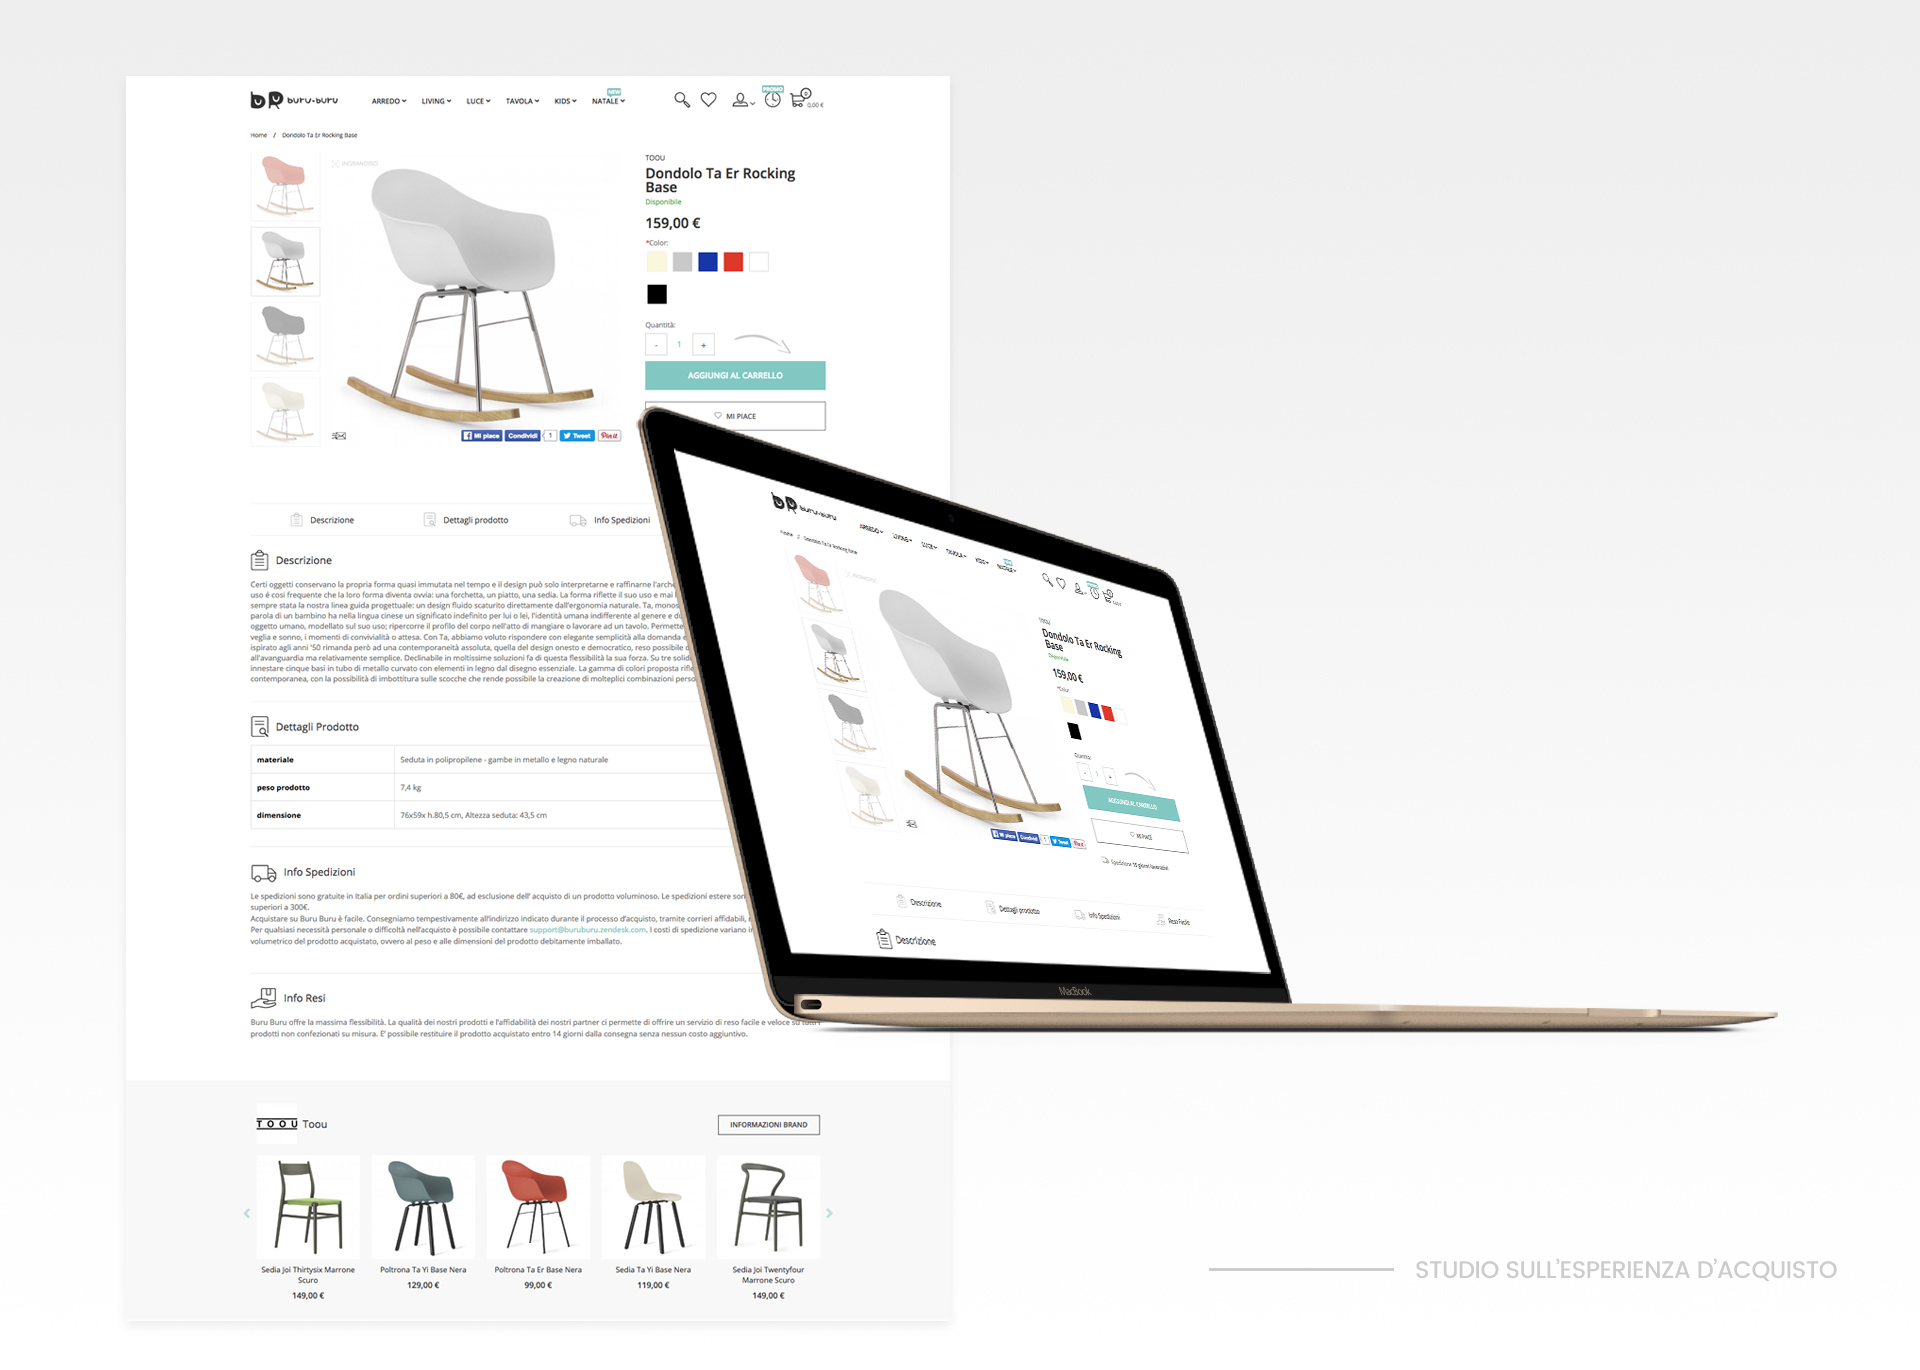 buru buru product page